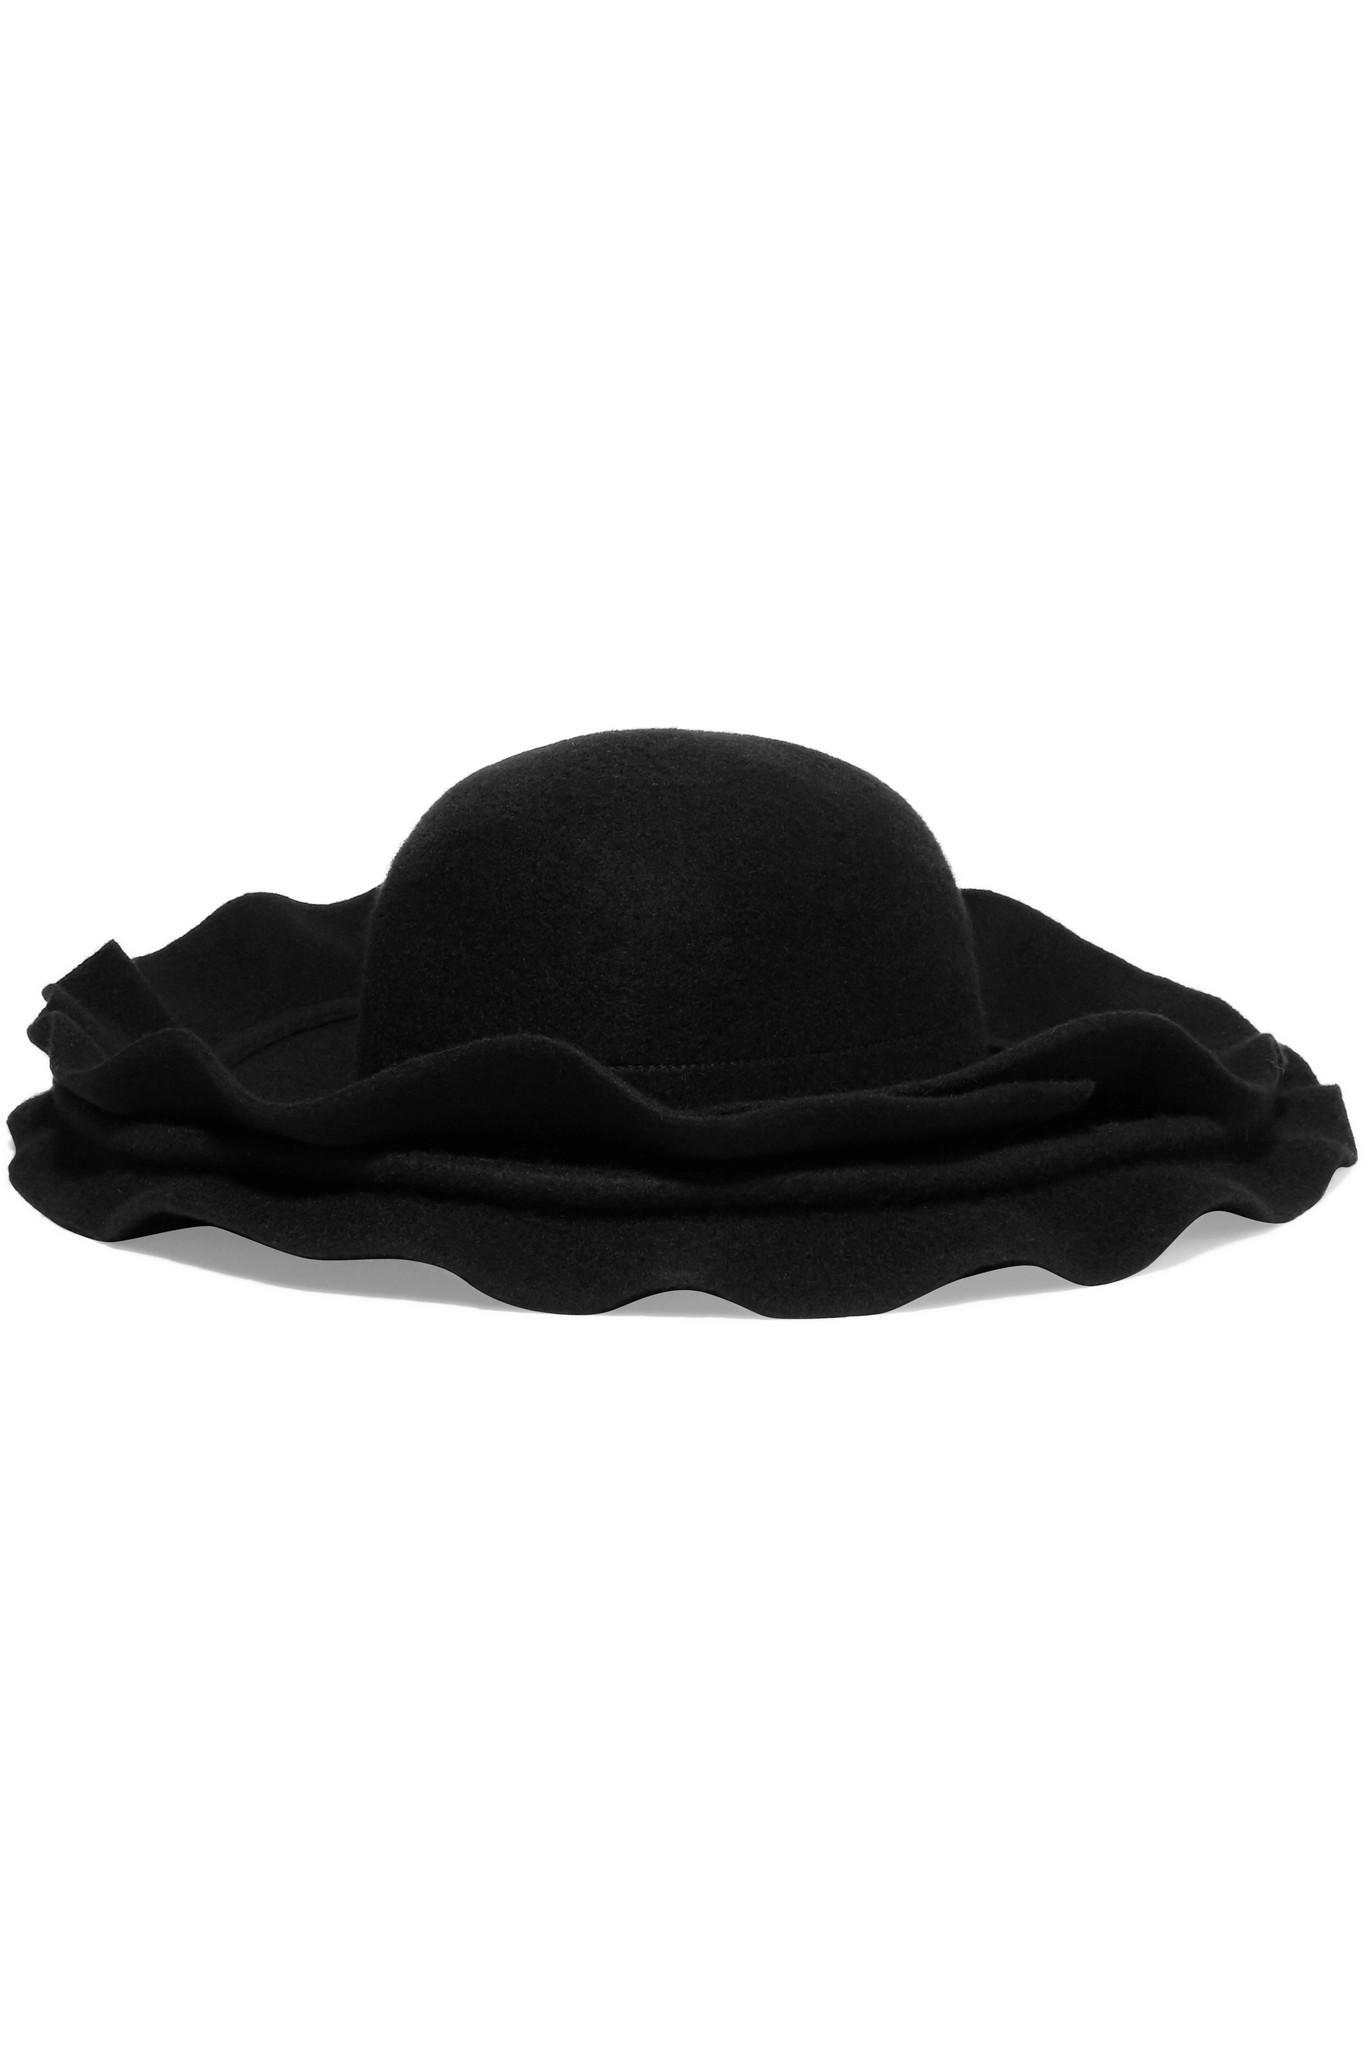 26a7feccb Comme des Garçons Black Layered Wool-felt Hat